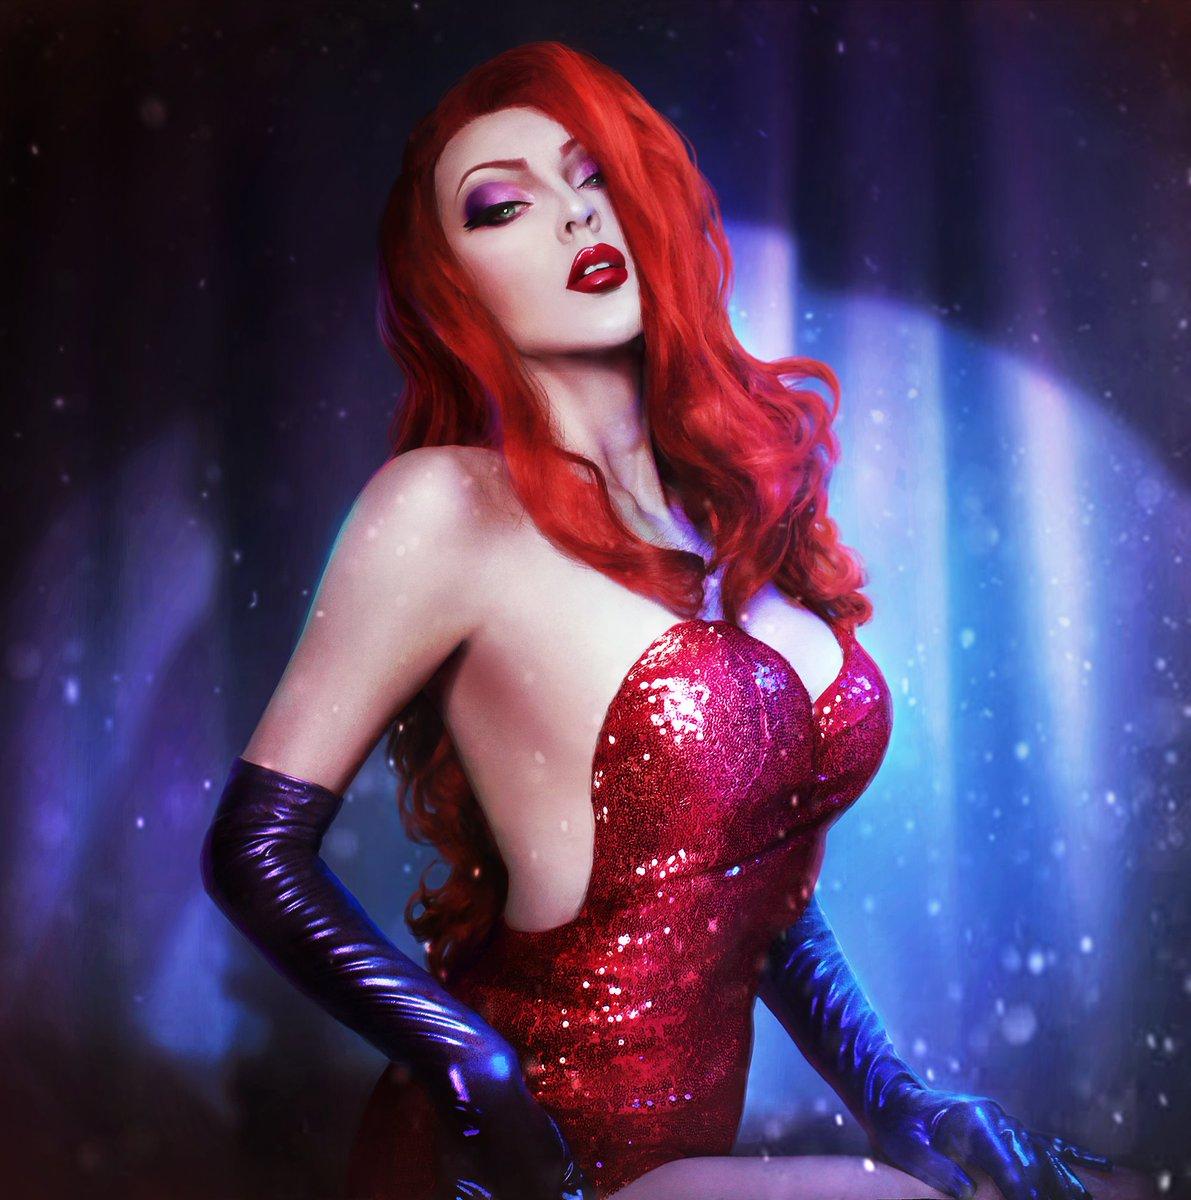 #whoframedrogerrabbit #jessica #jessicarabbit #cosplay  #disney #disneycosplay #makeup #sexy   Will you be my rabbit?💗